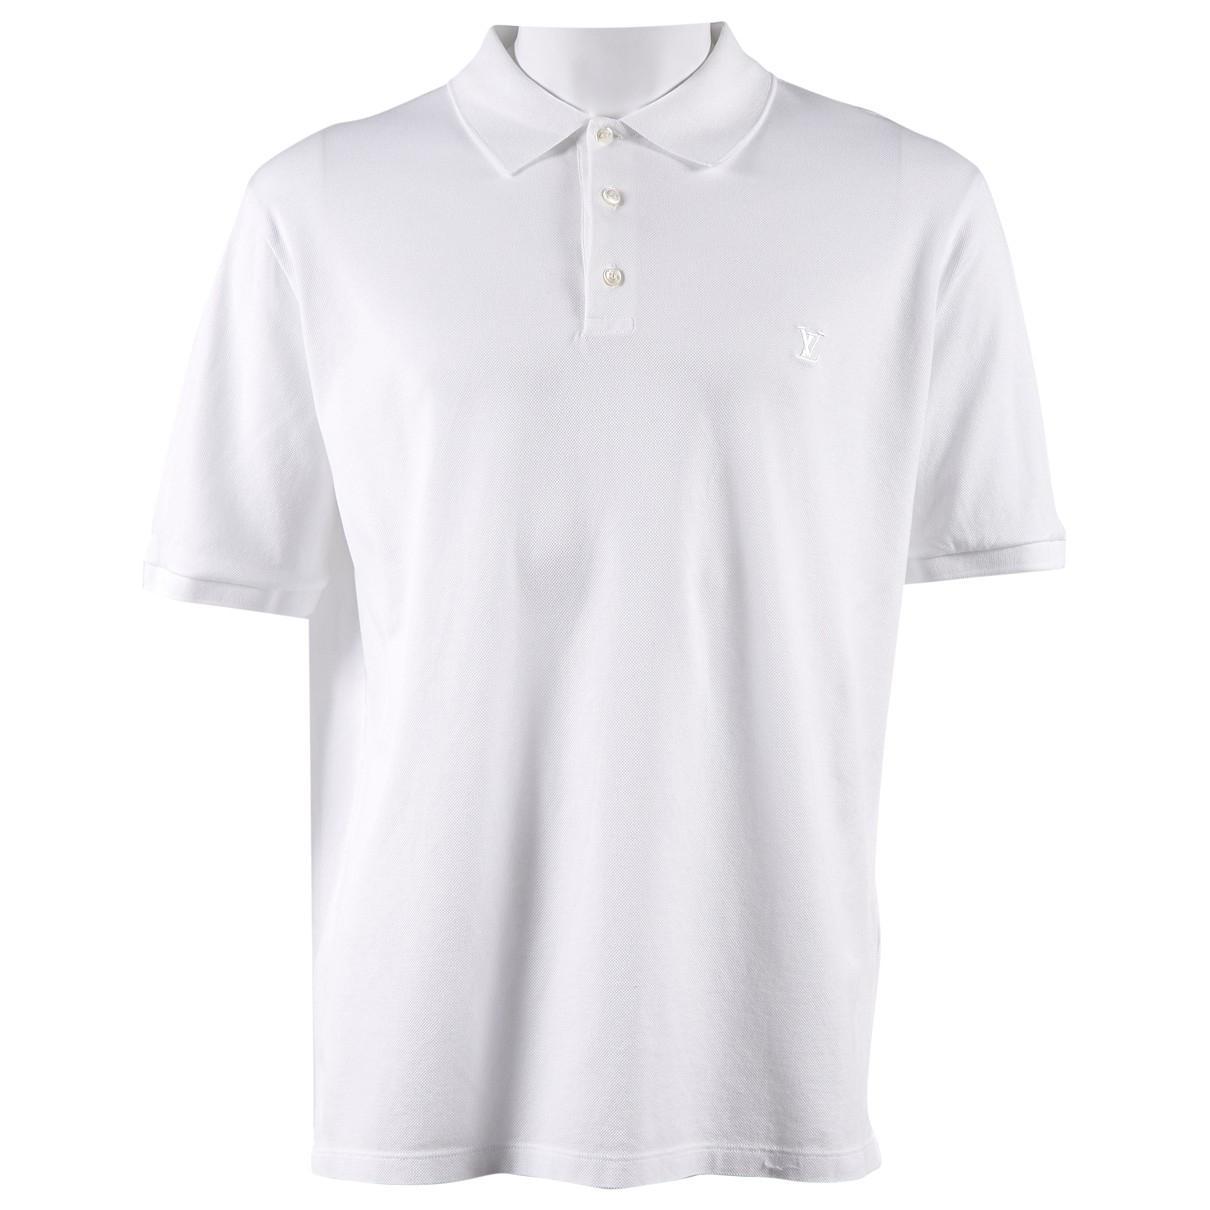 Louis Vuitton Polo Shirt T Shirt Design Database